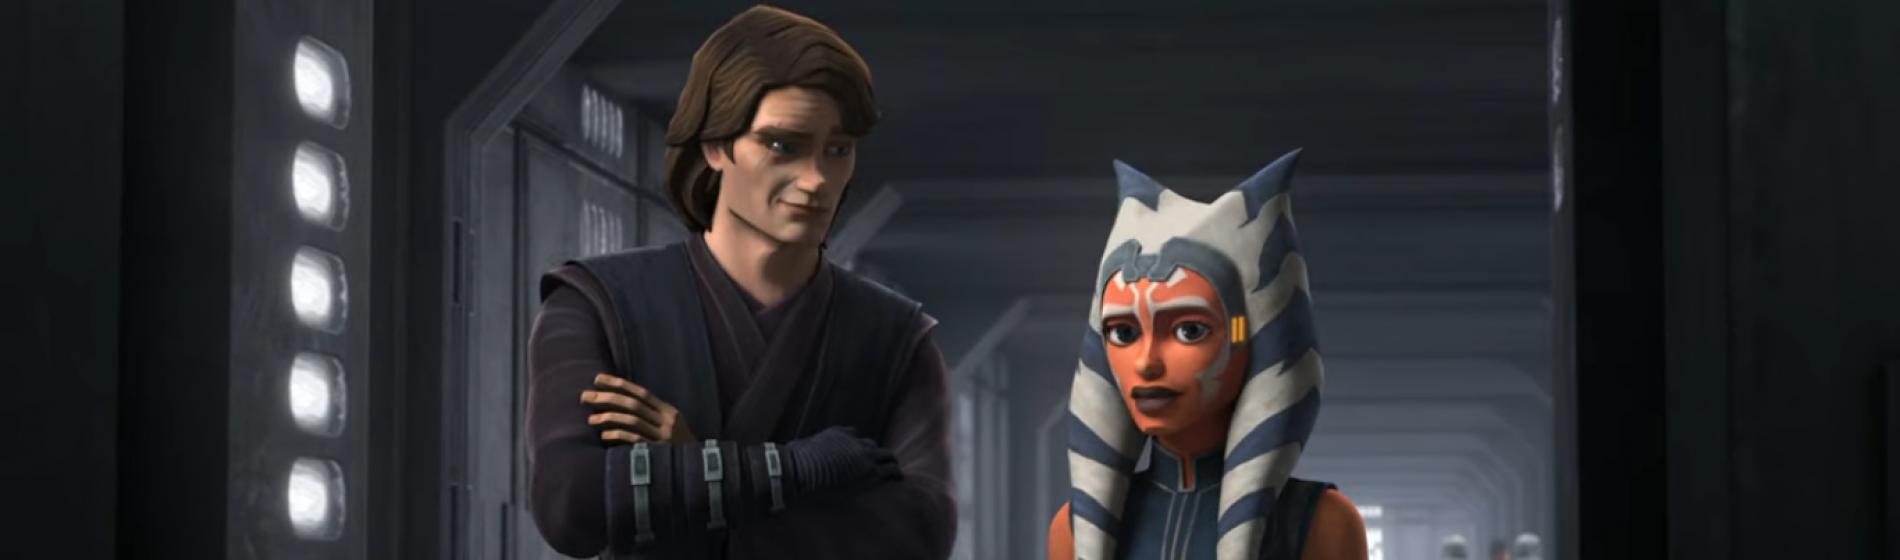 clone wars trailer